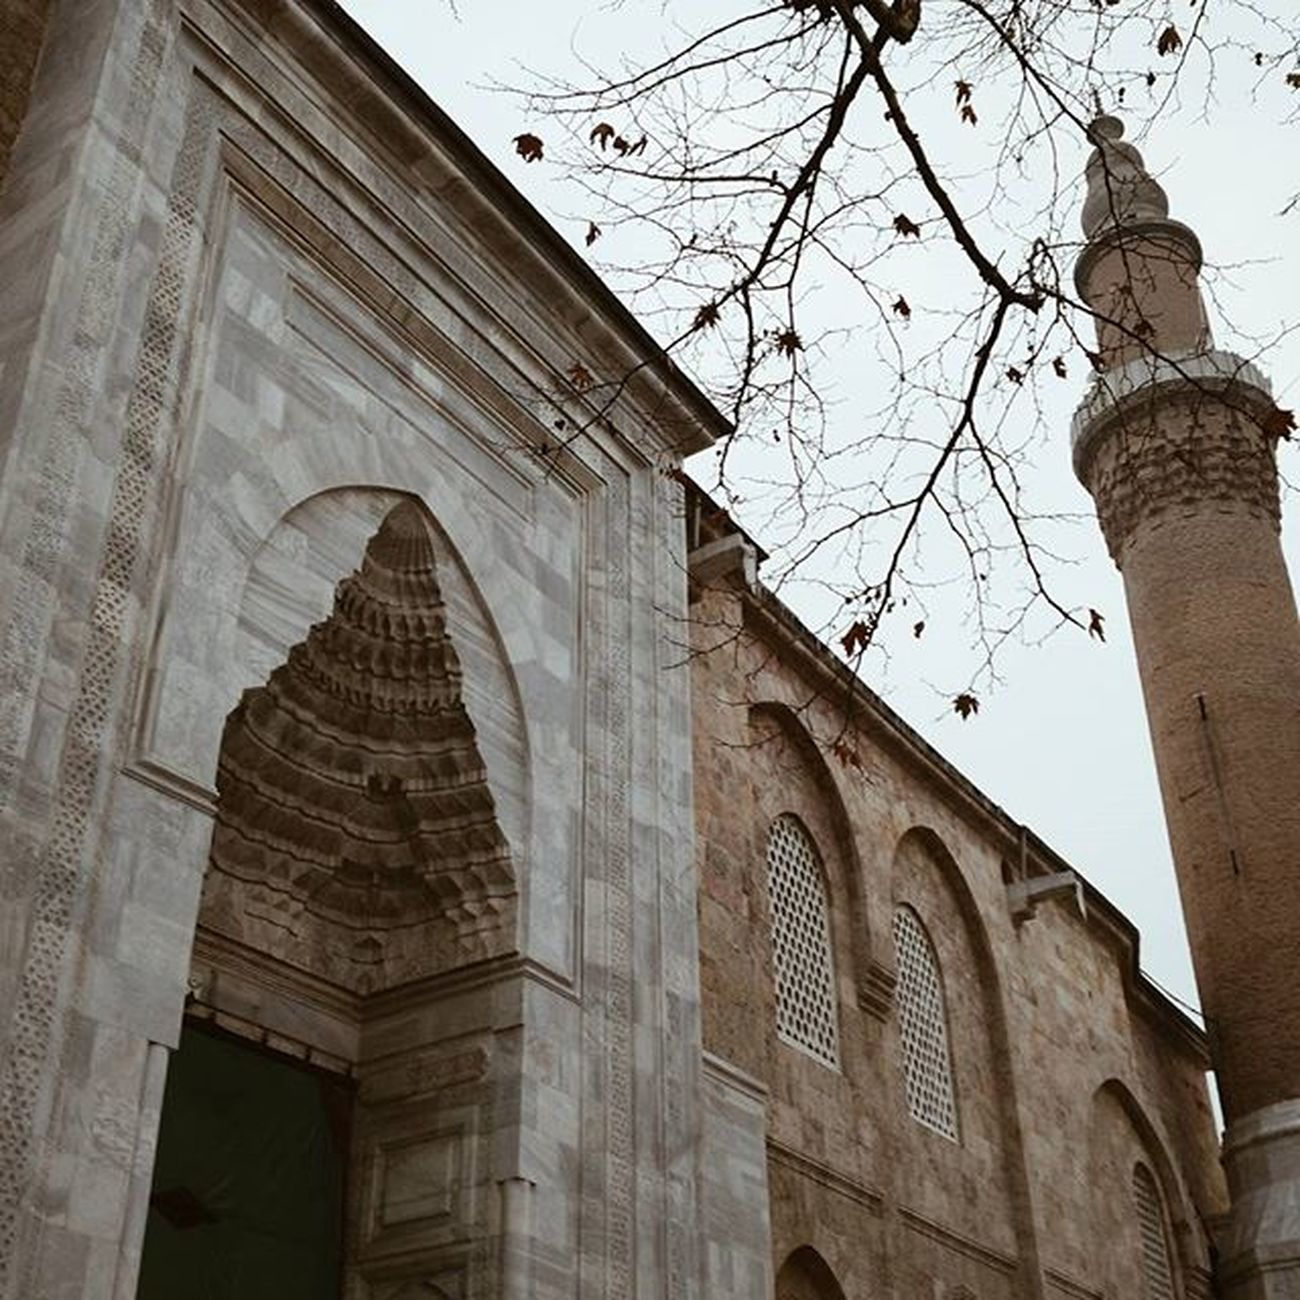 Ulu Camii Zharipxbursa Camii Mosque Osmanlı Tarih  History Ulucamii